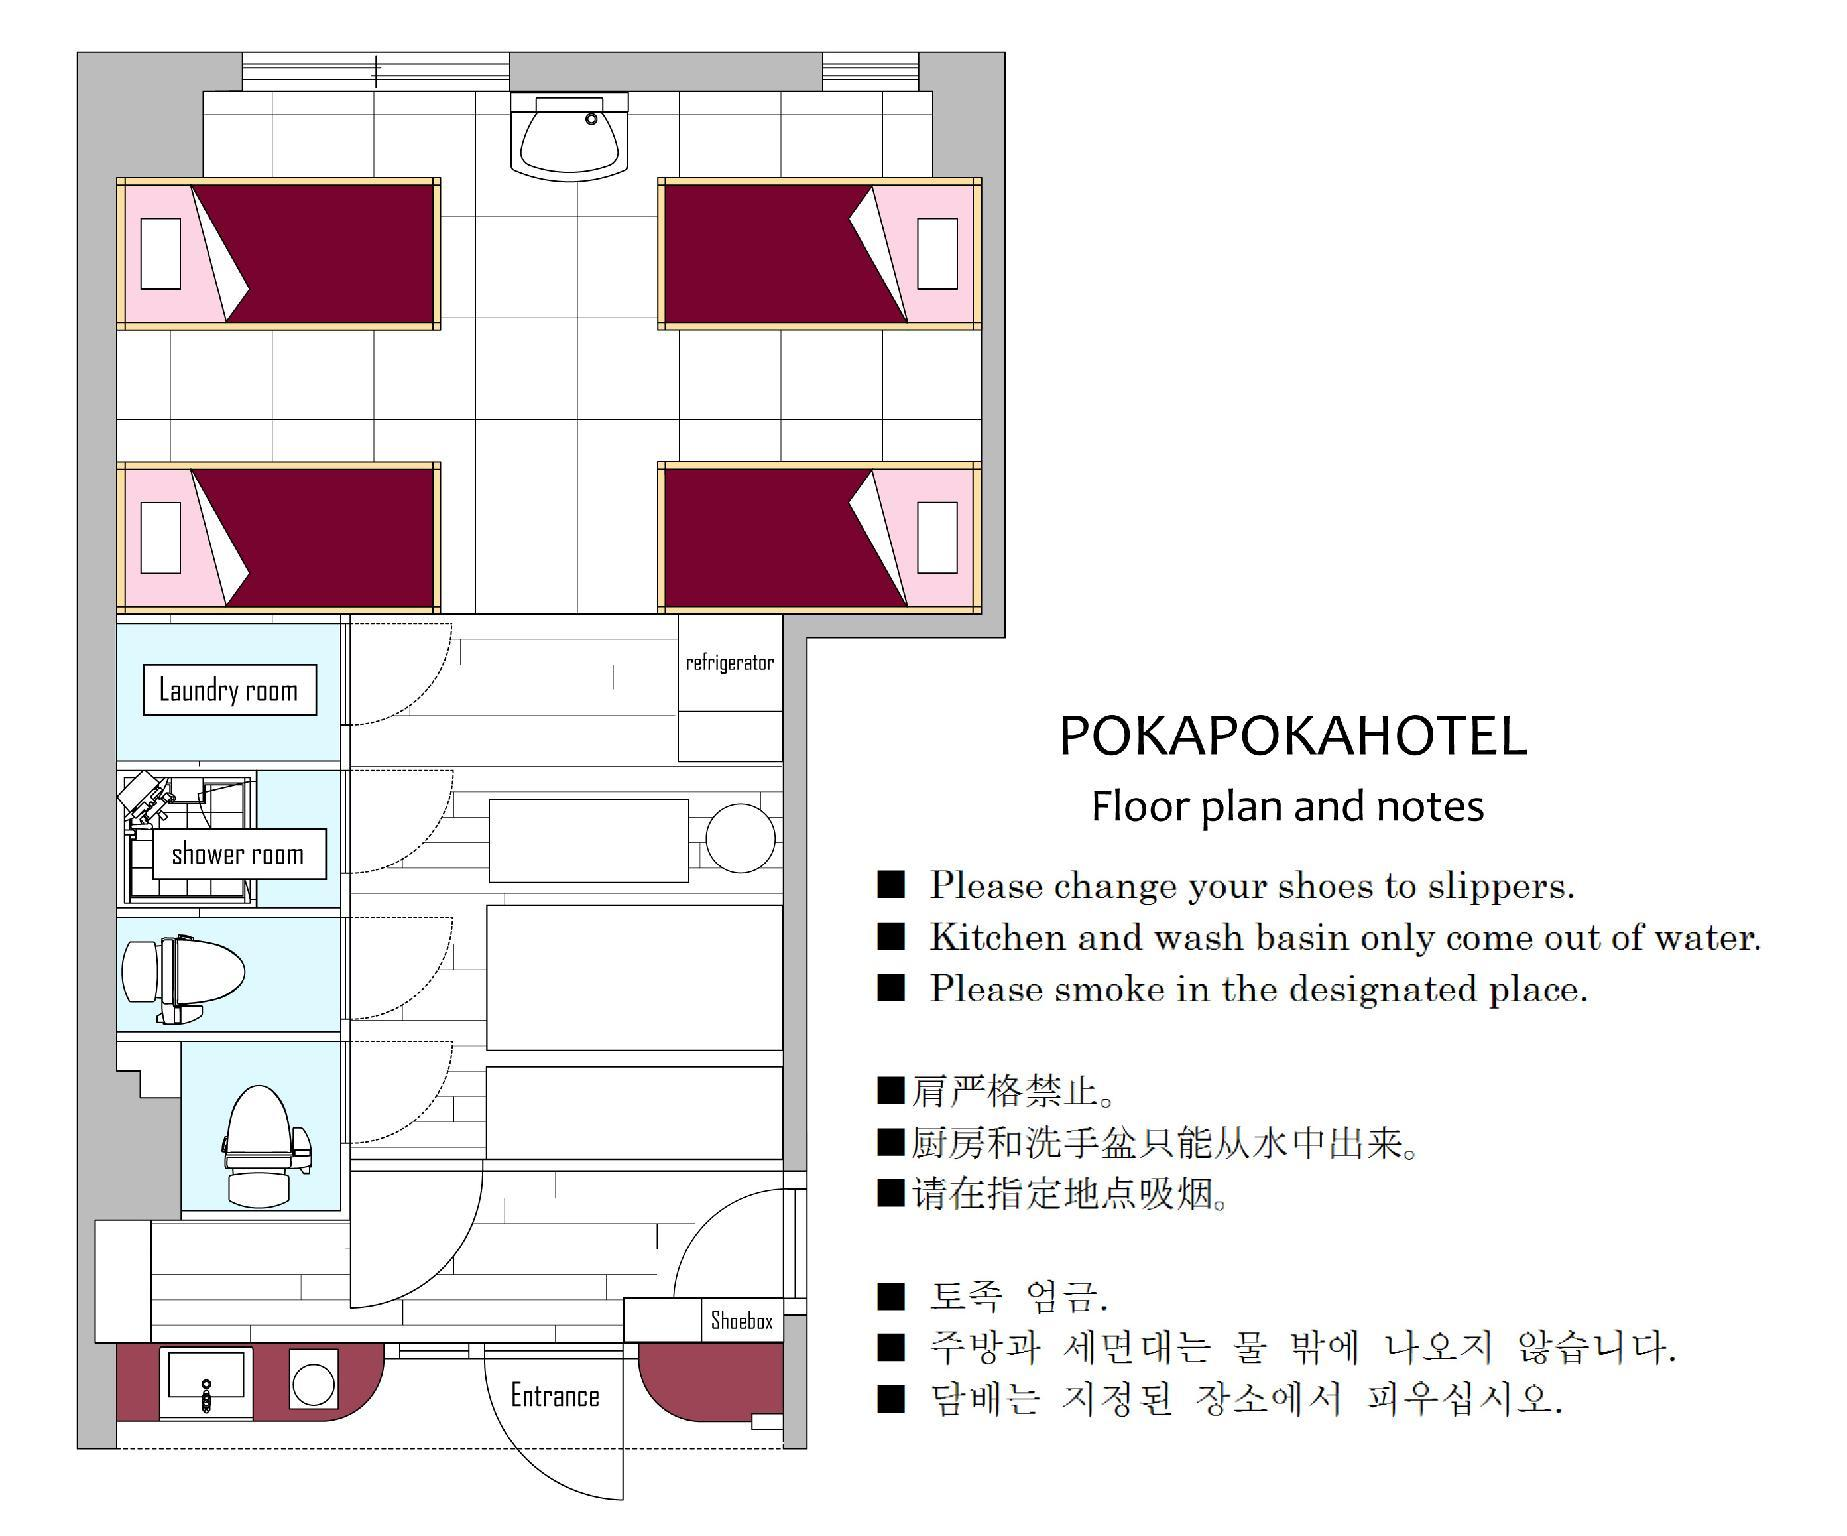 POKAPOKAHOTEL